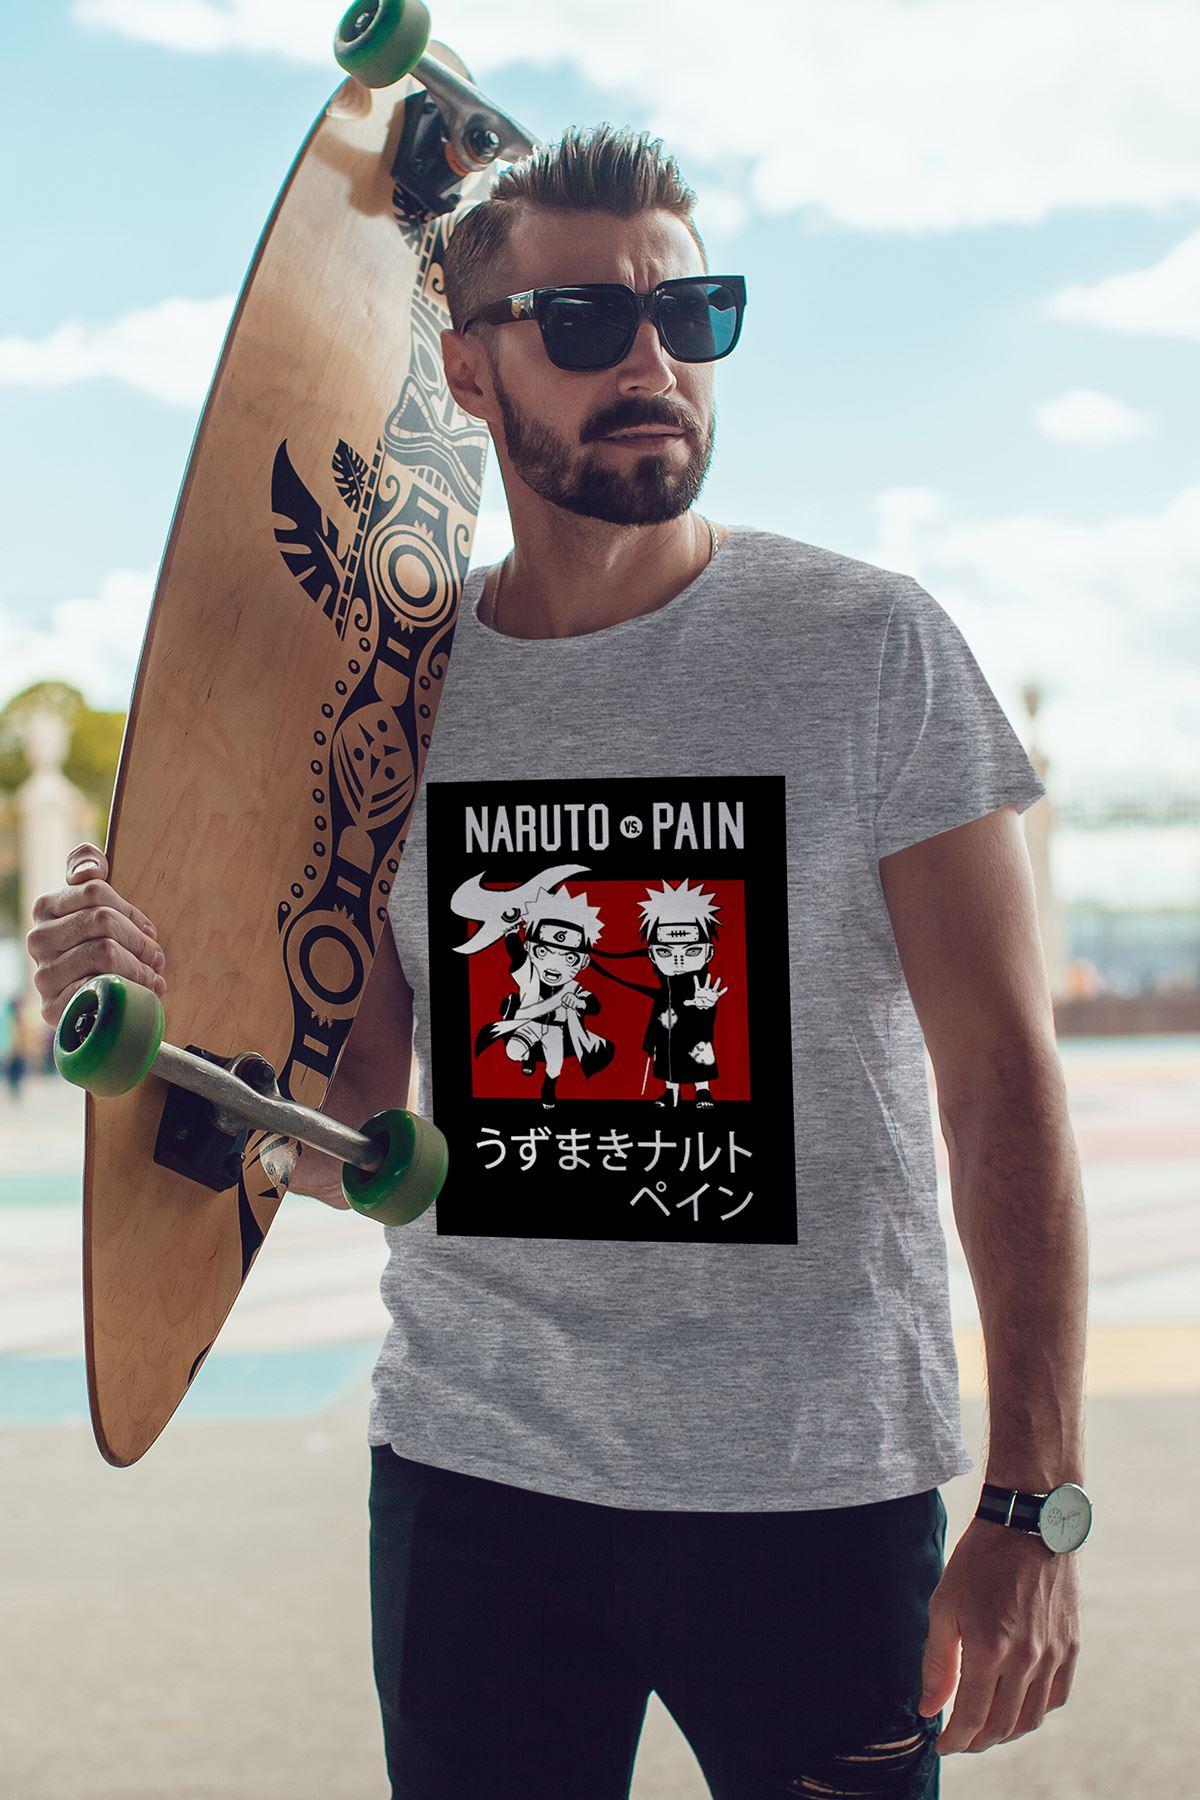 Naruto Anime 04 Gri Erkek Tshirt - Tişört